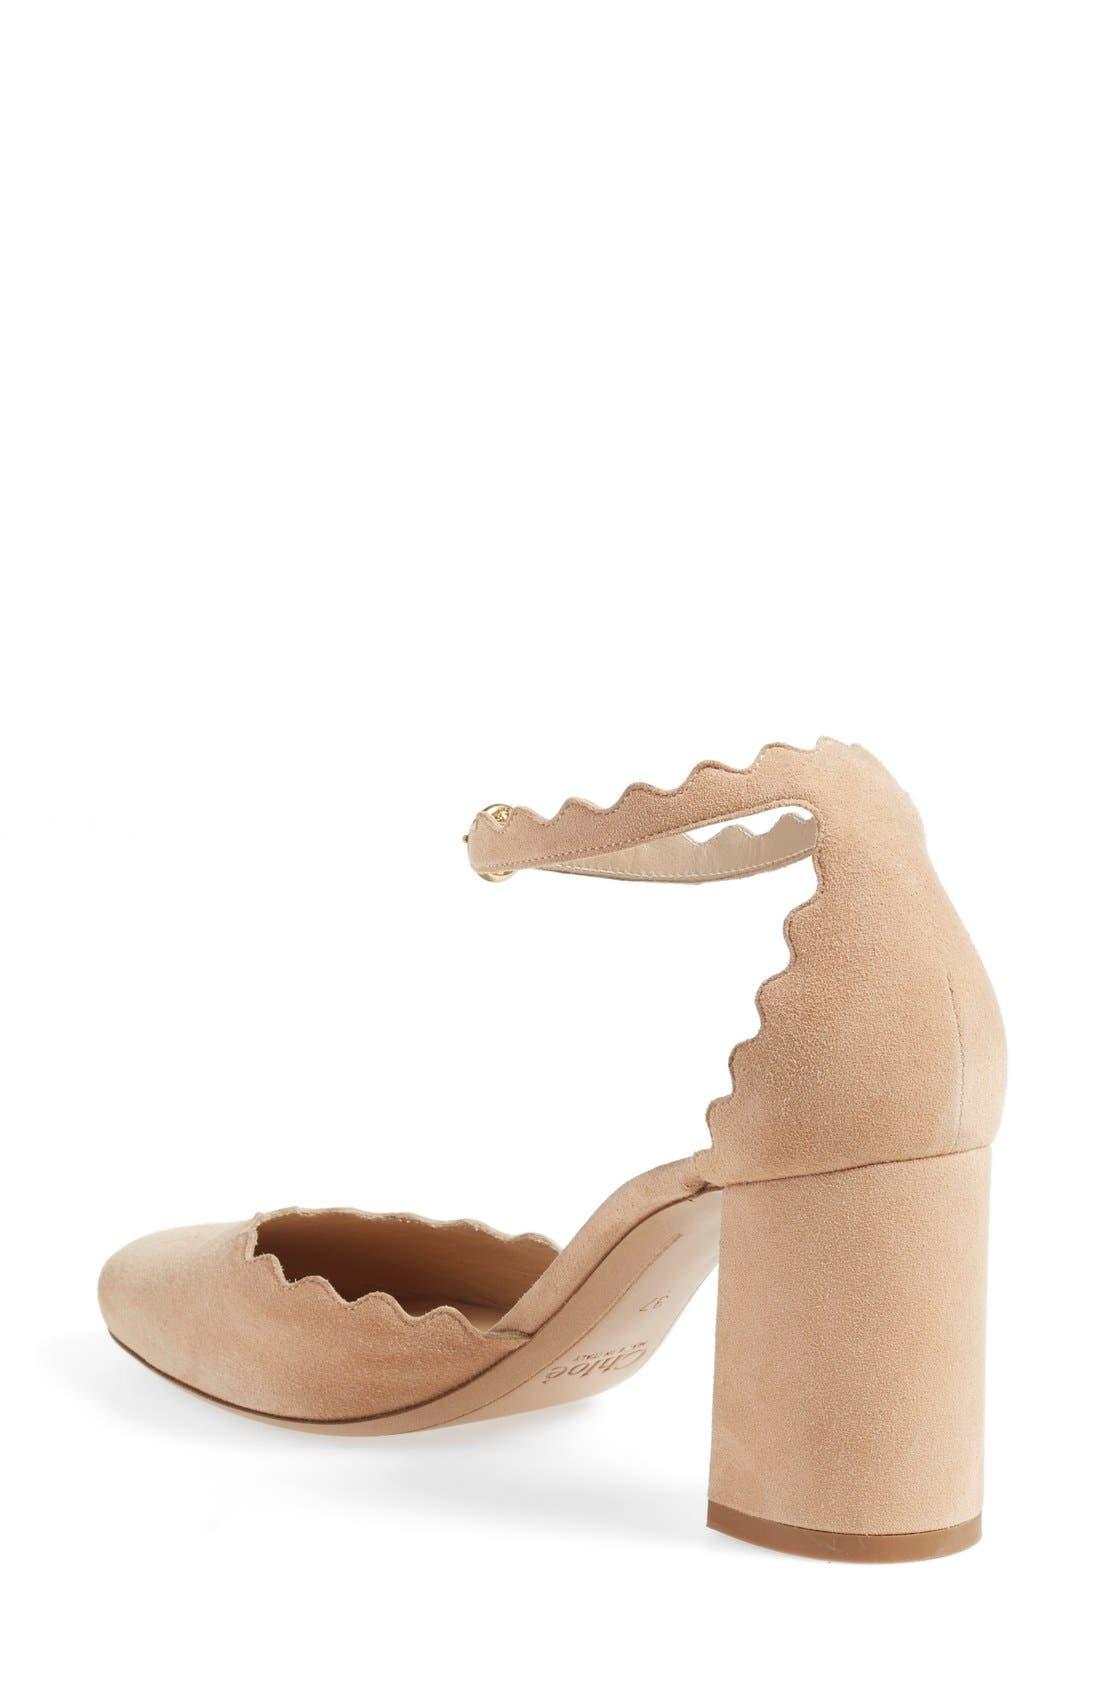 Alternate Image 2  - Chloé Scalloped Ankle Strap d'Orsay Pump (Women)